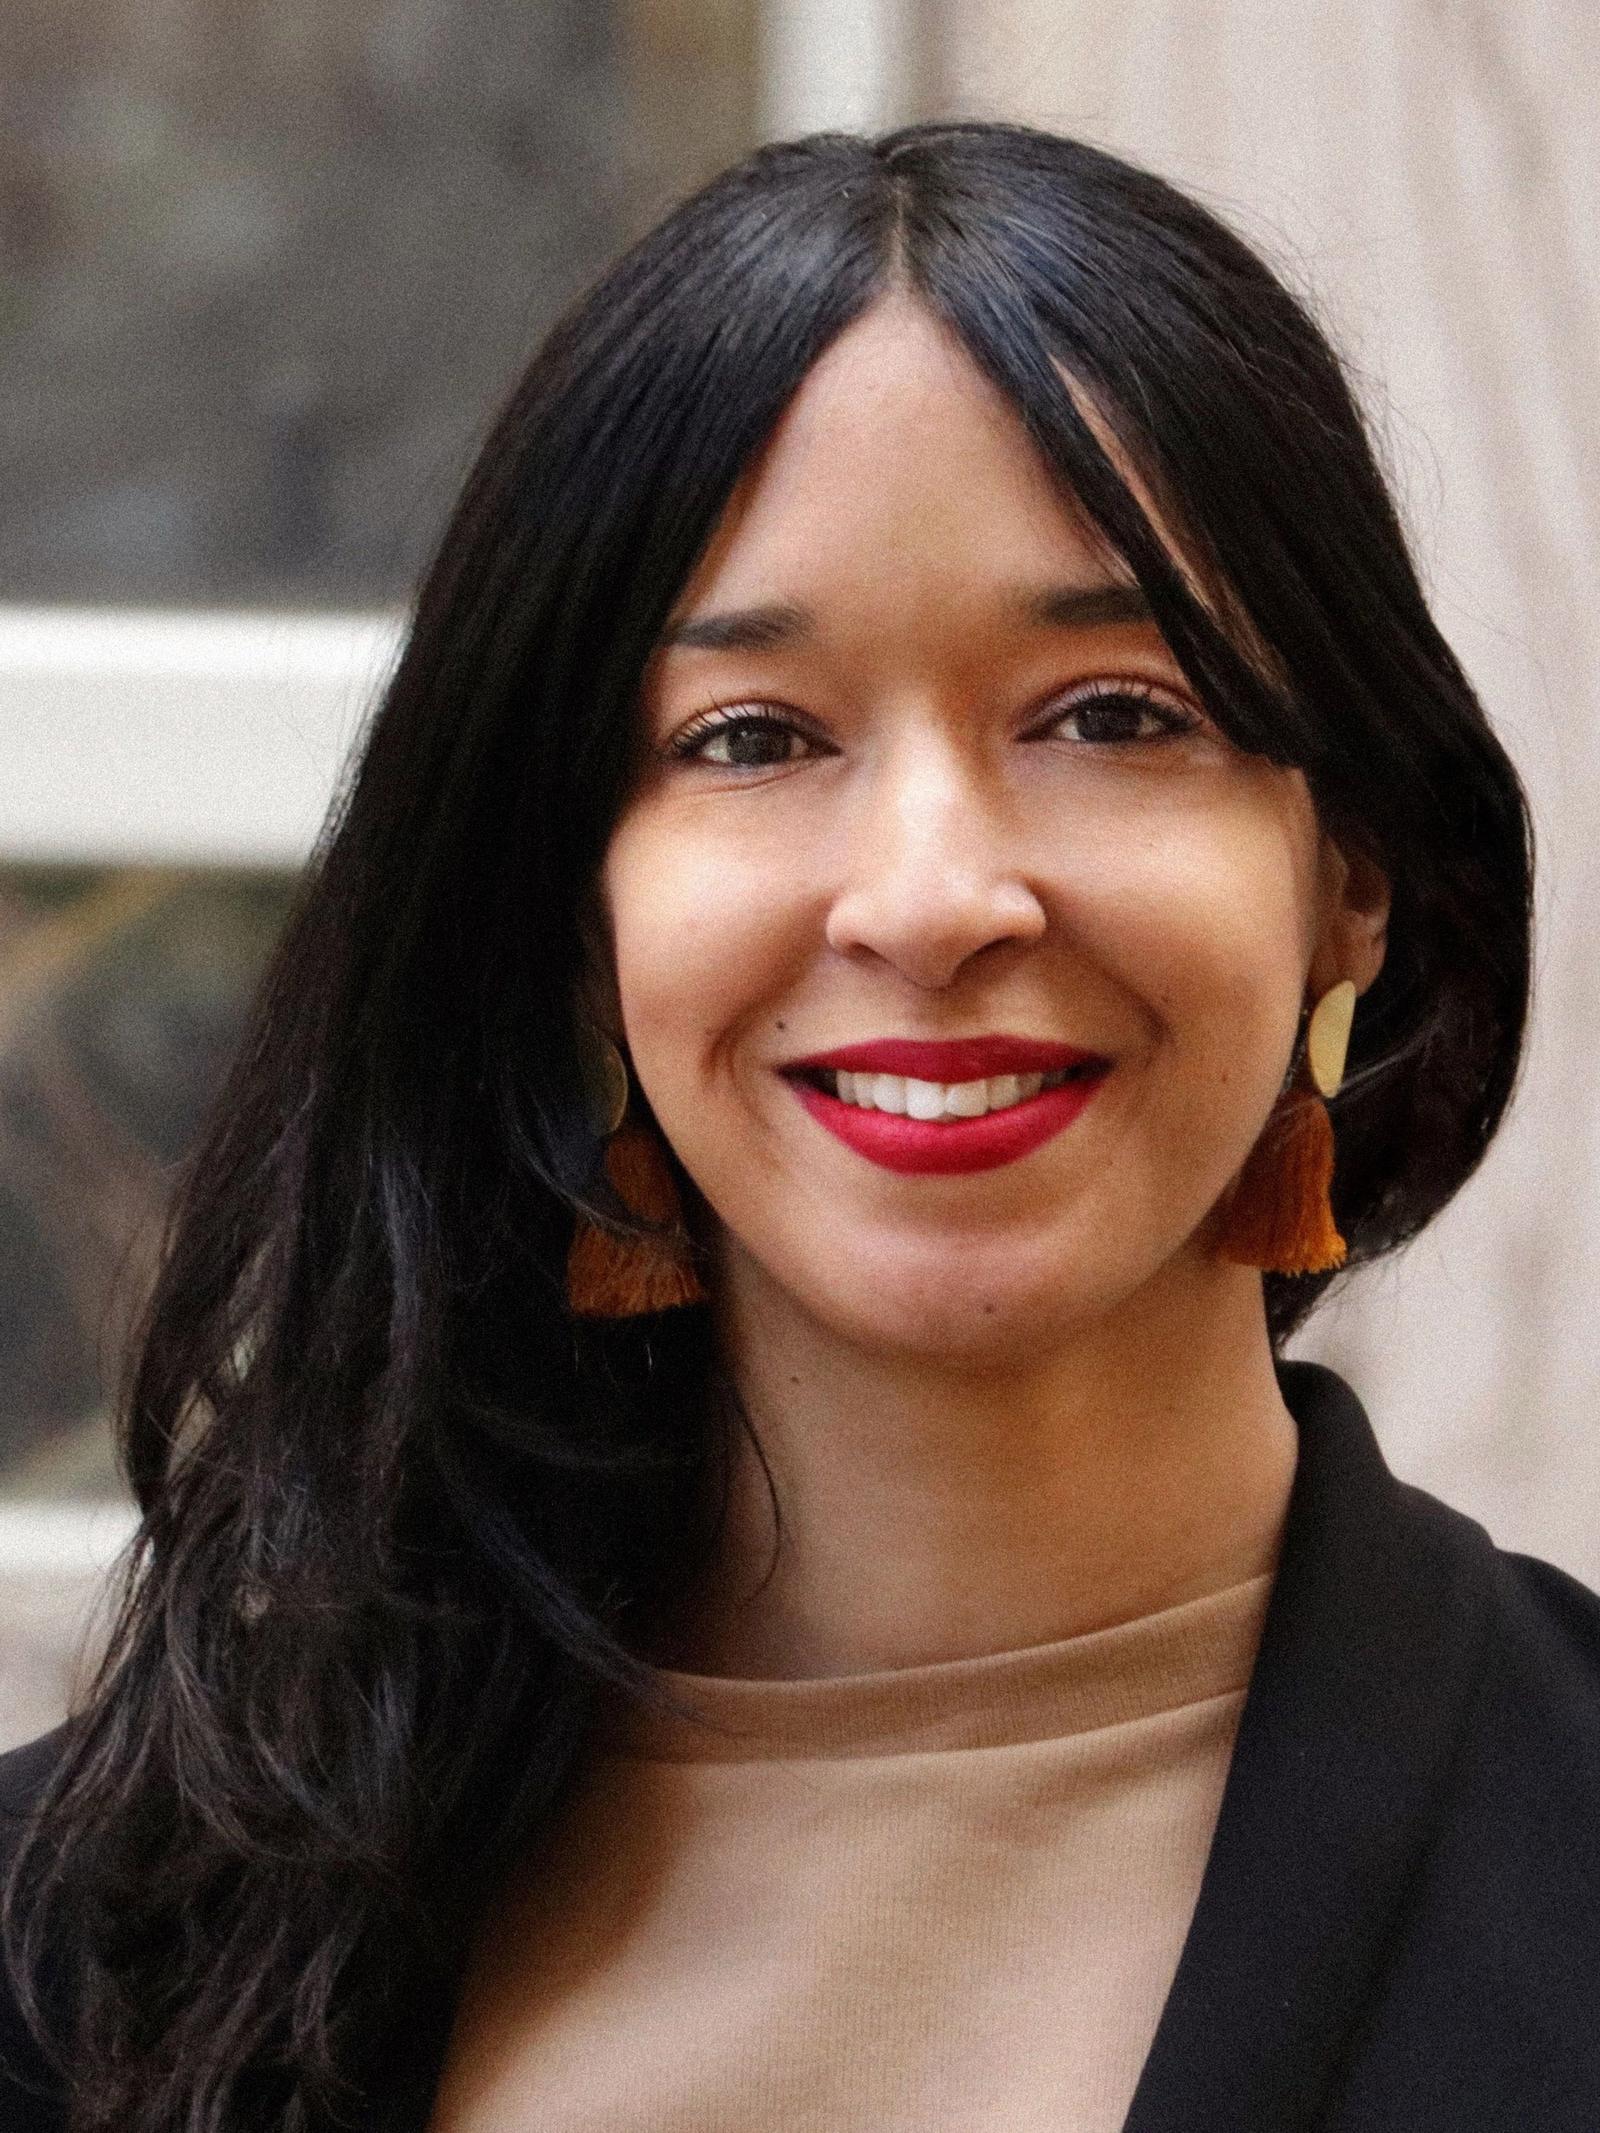 Photo of Yojaira Alvarez